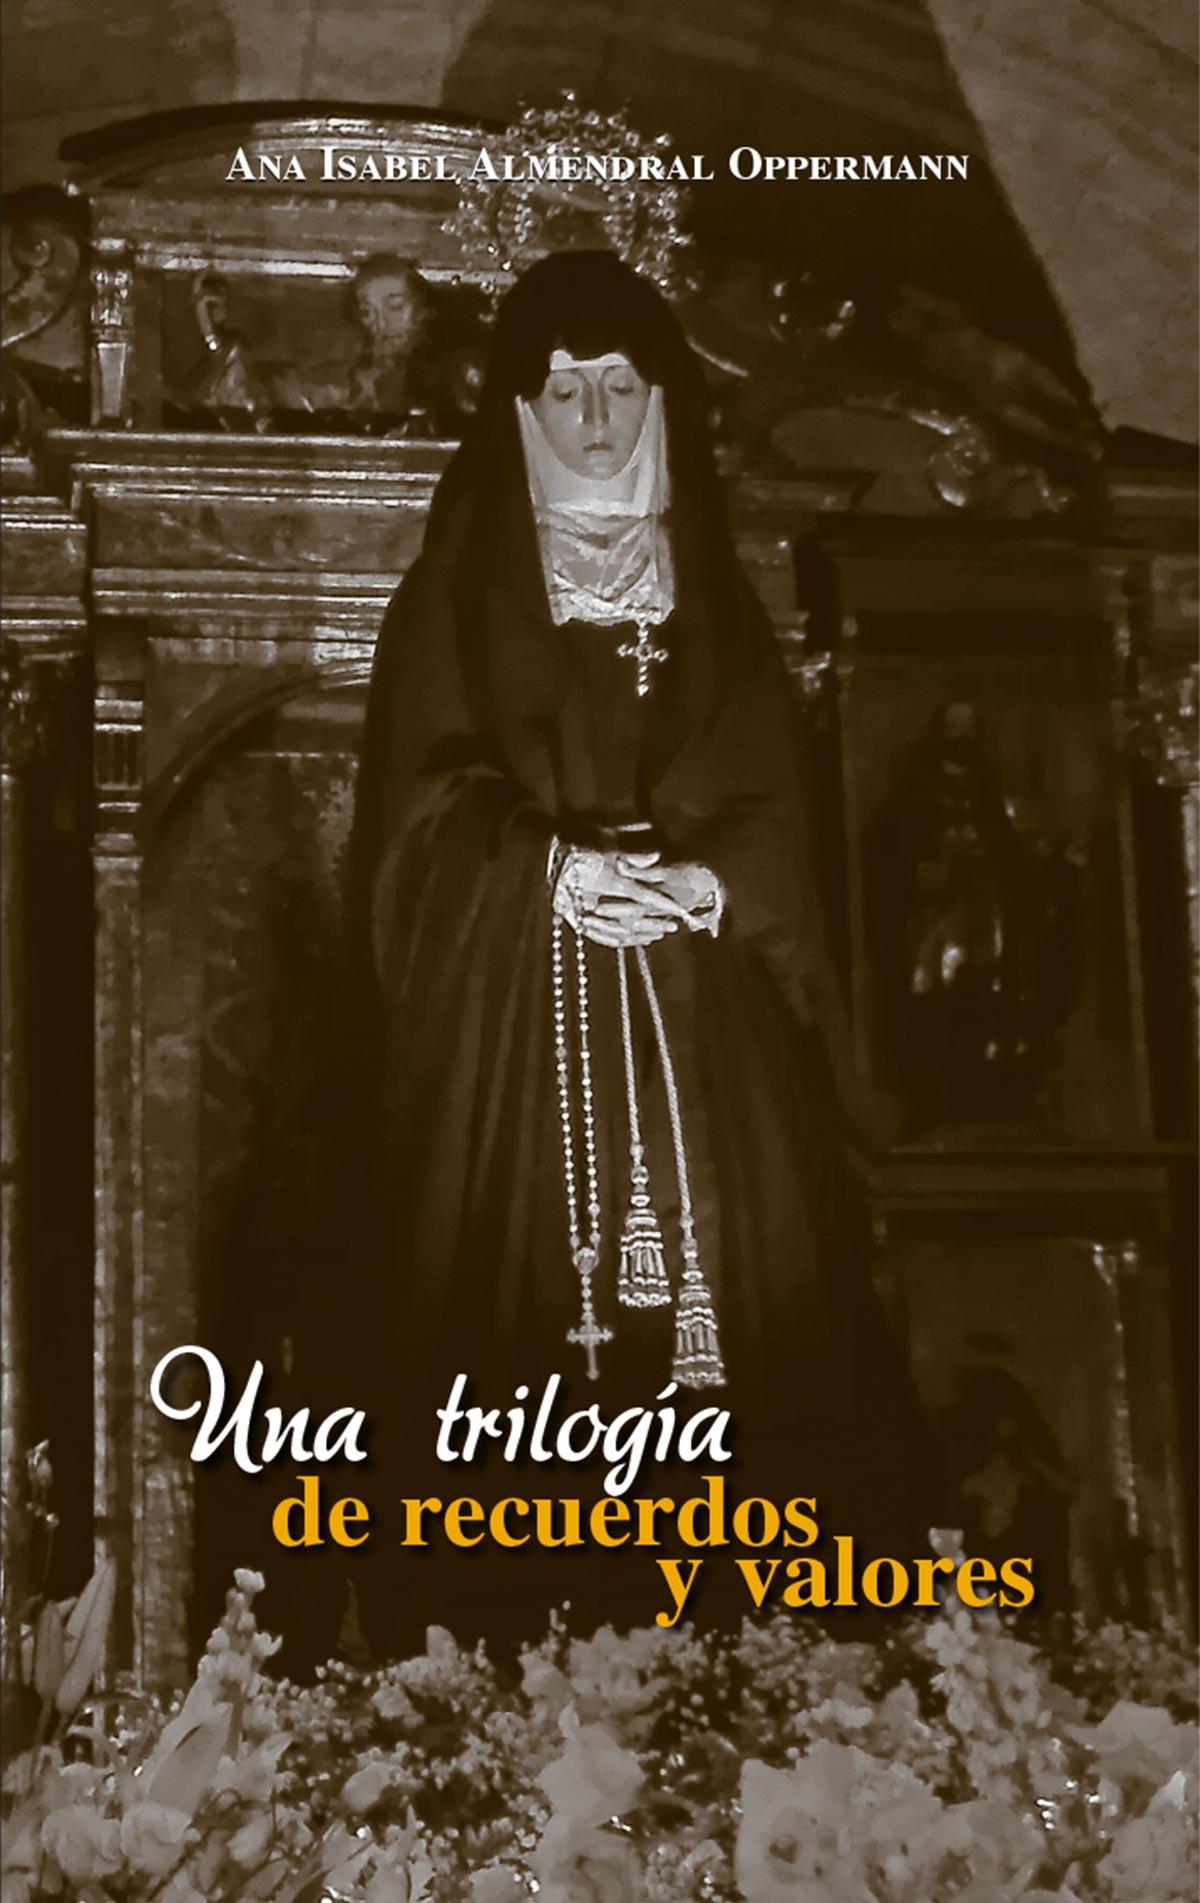 trilogía recuerdos valores Ana Isabel Almendral Oppermann Editorial Semuret